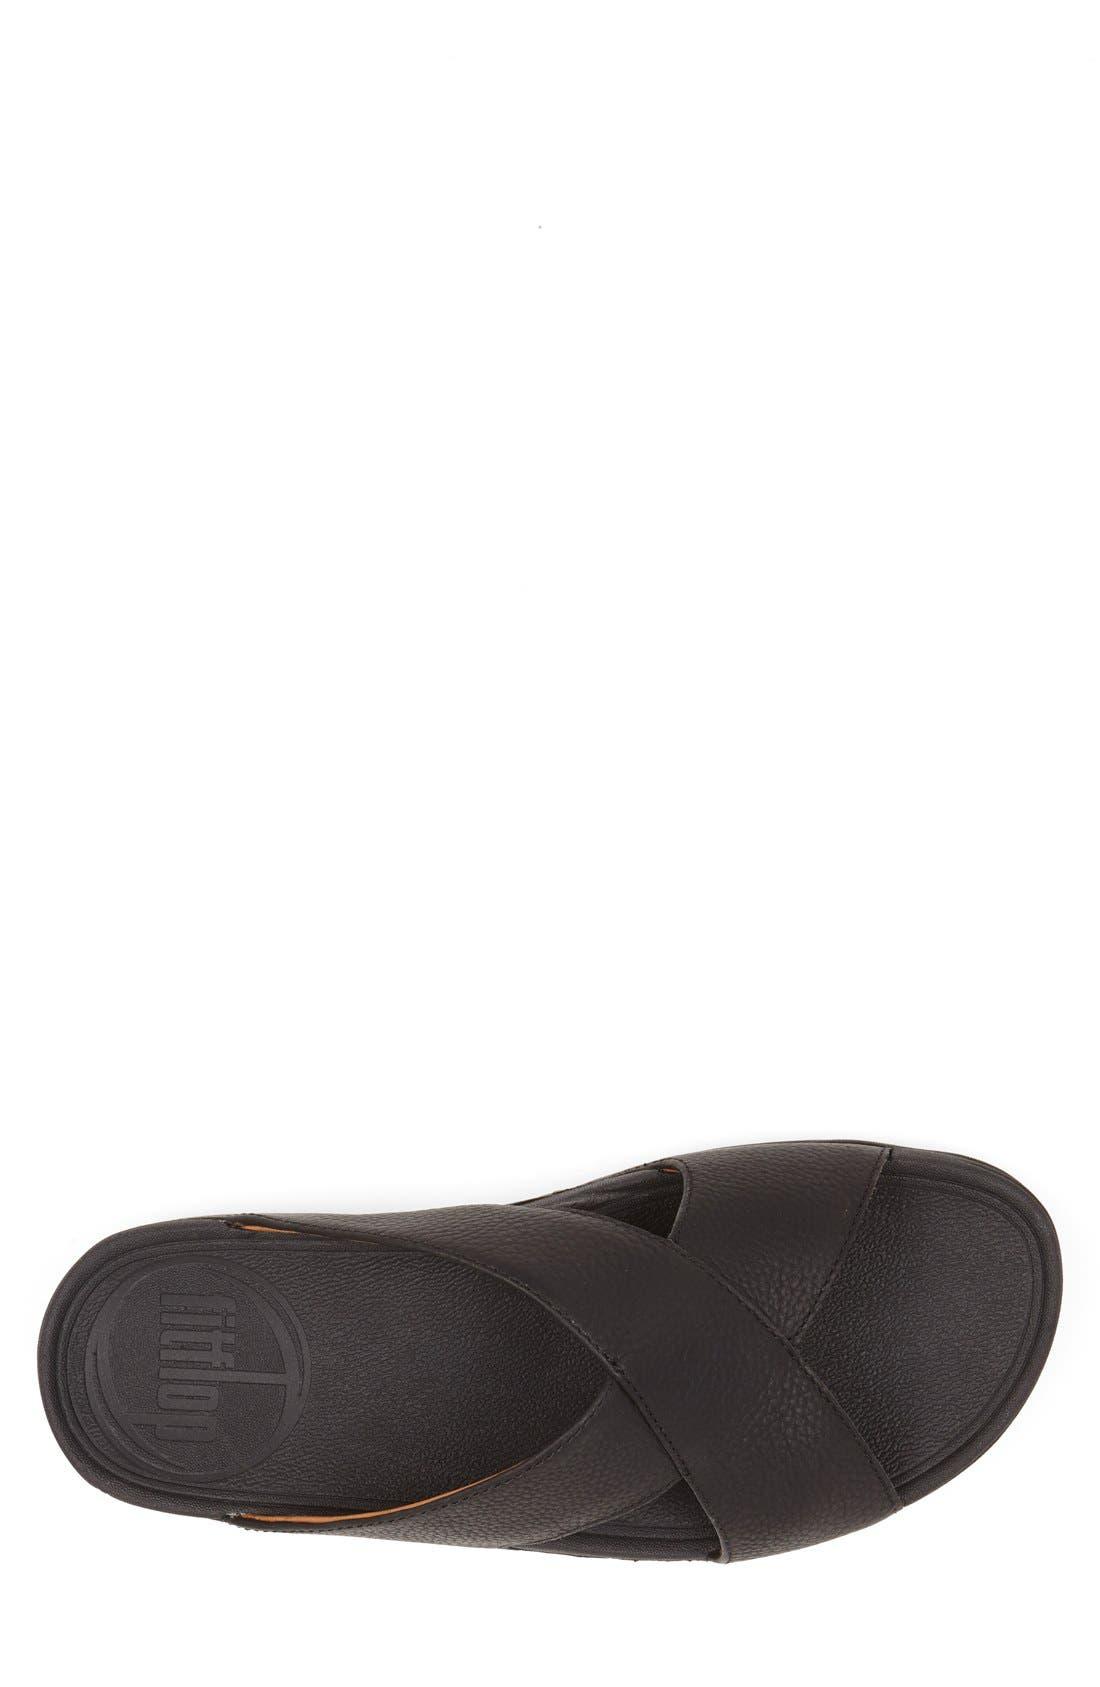 Xosa<sup>™</sup> Leather Slide Sandal,                             Alternate thumbnail 4, color,                             001